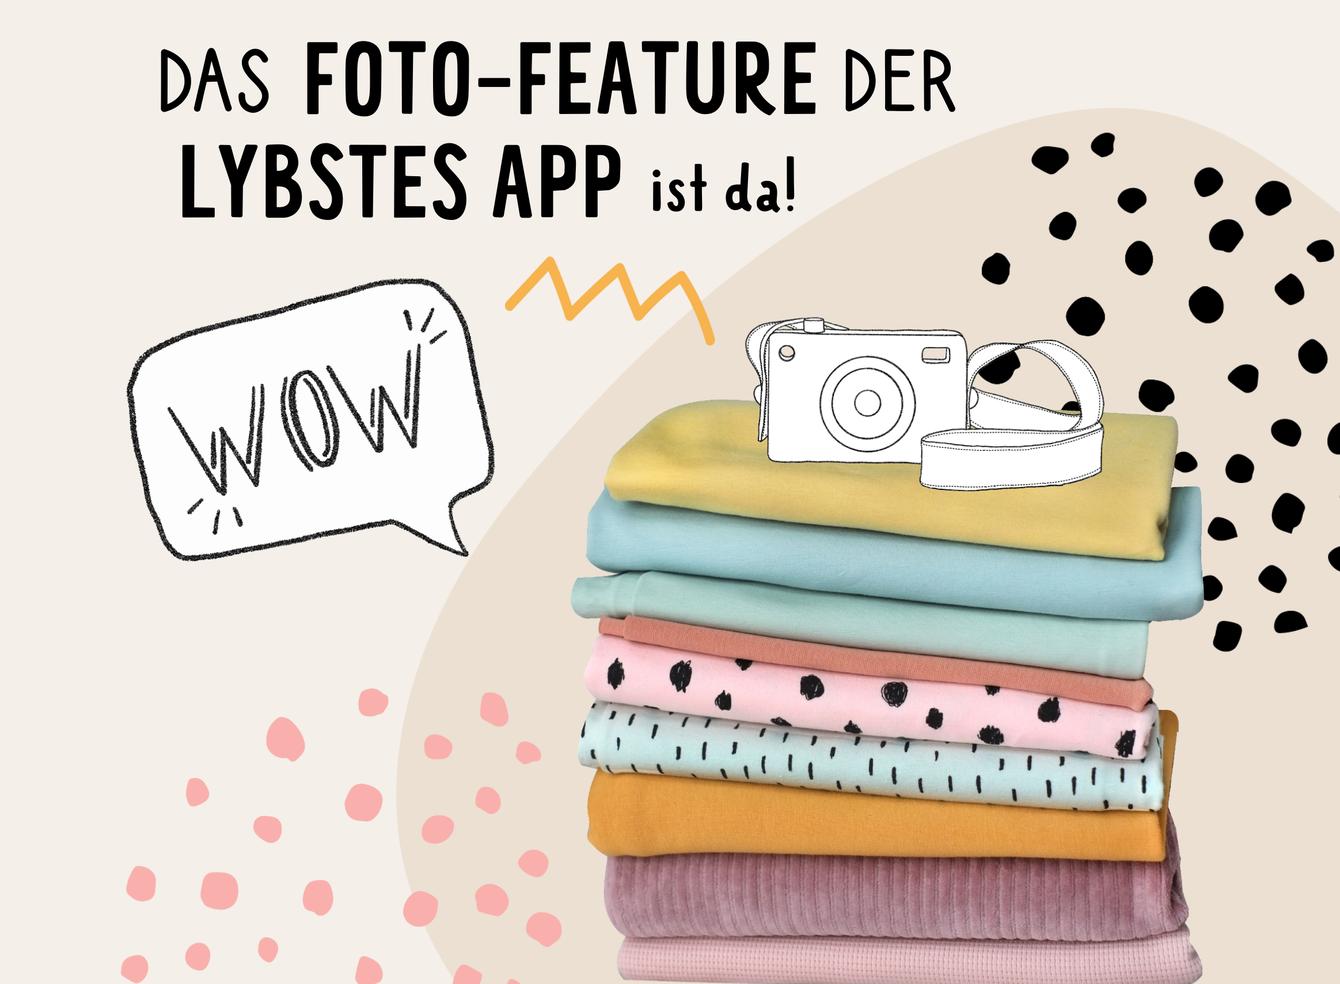 LYBSTES APP: Das Foto-Feature ist da!!!